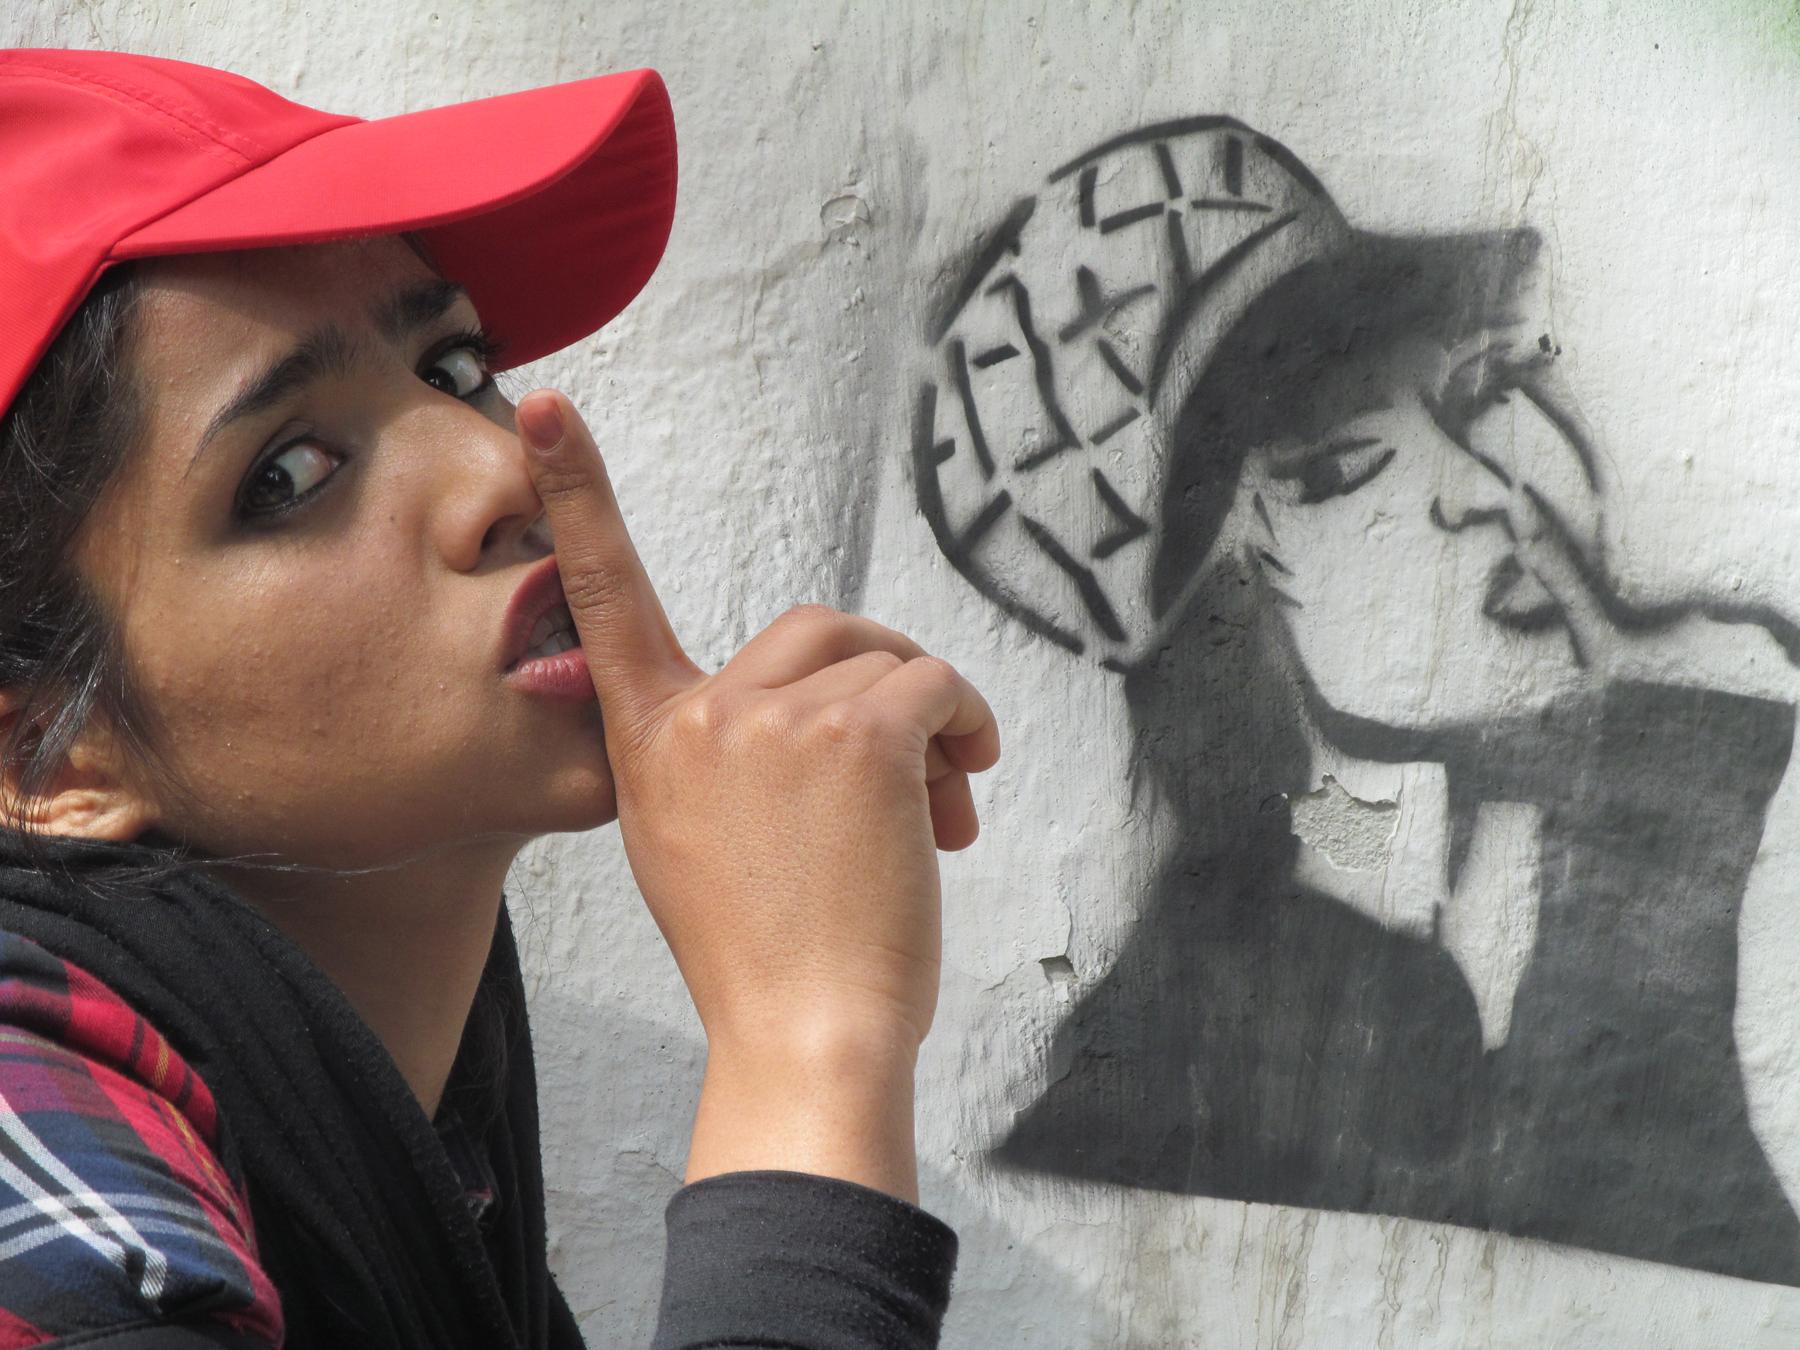 Sonita, directed by Rokhsareh Ghaemmaghami